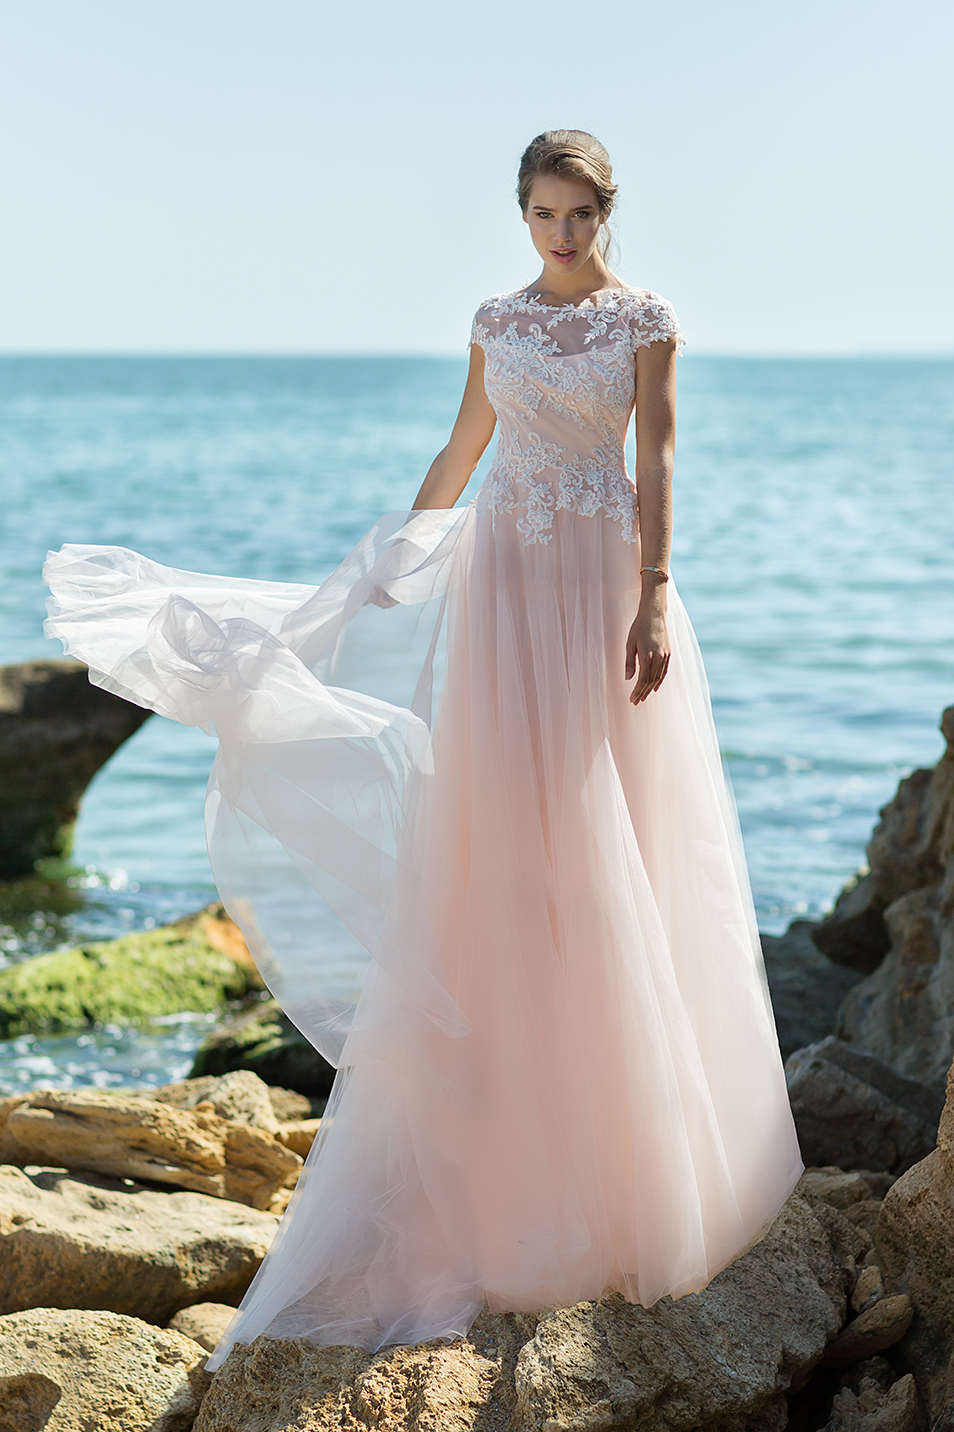 486be98bfd8 Легкое свадебное платье Ivanna